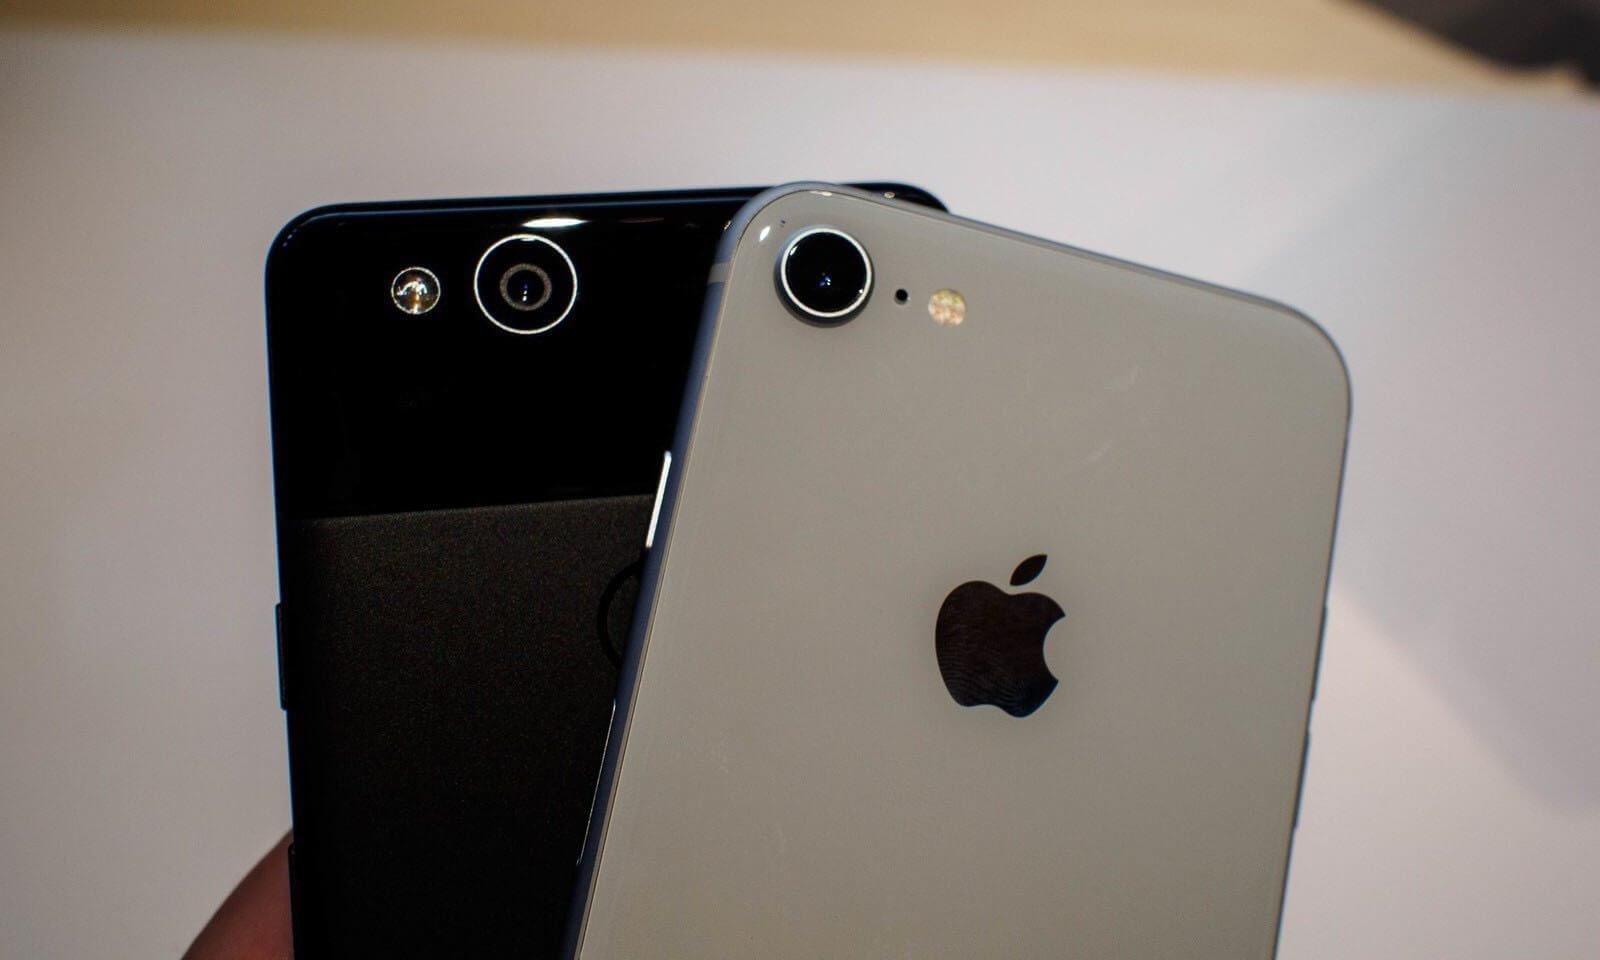 pixel 2 iphone camera - Comparativo: Google Pixel 2 e 2 XL x iPhone 8 e 8 Plus